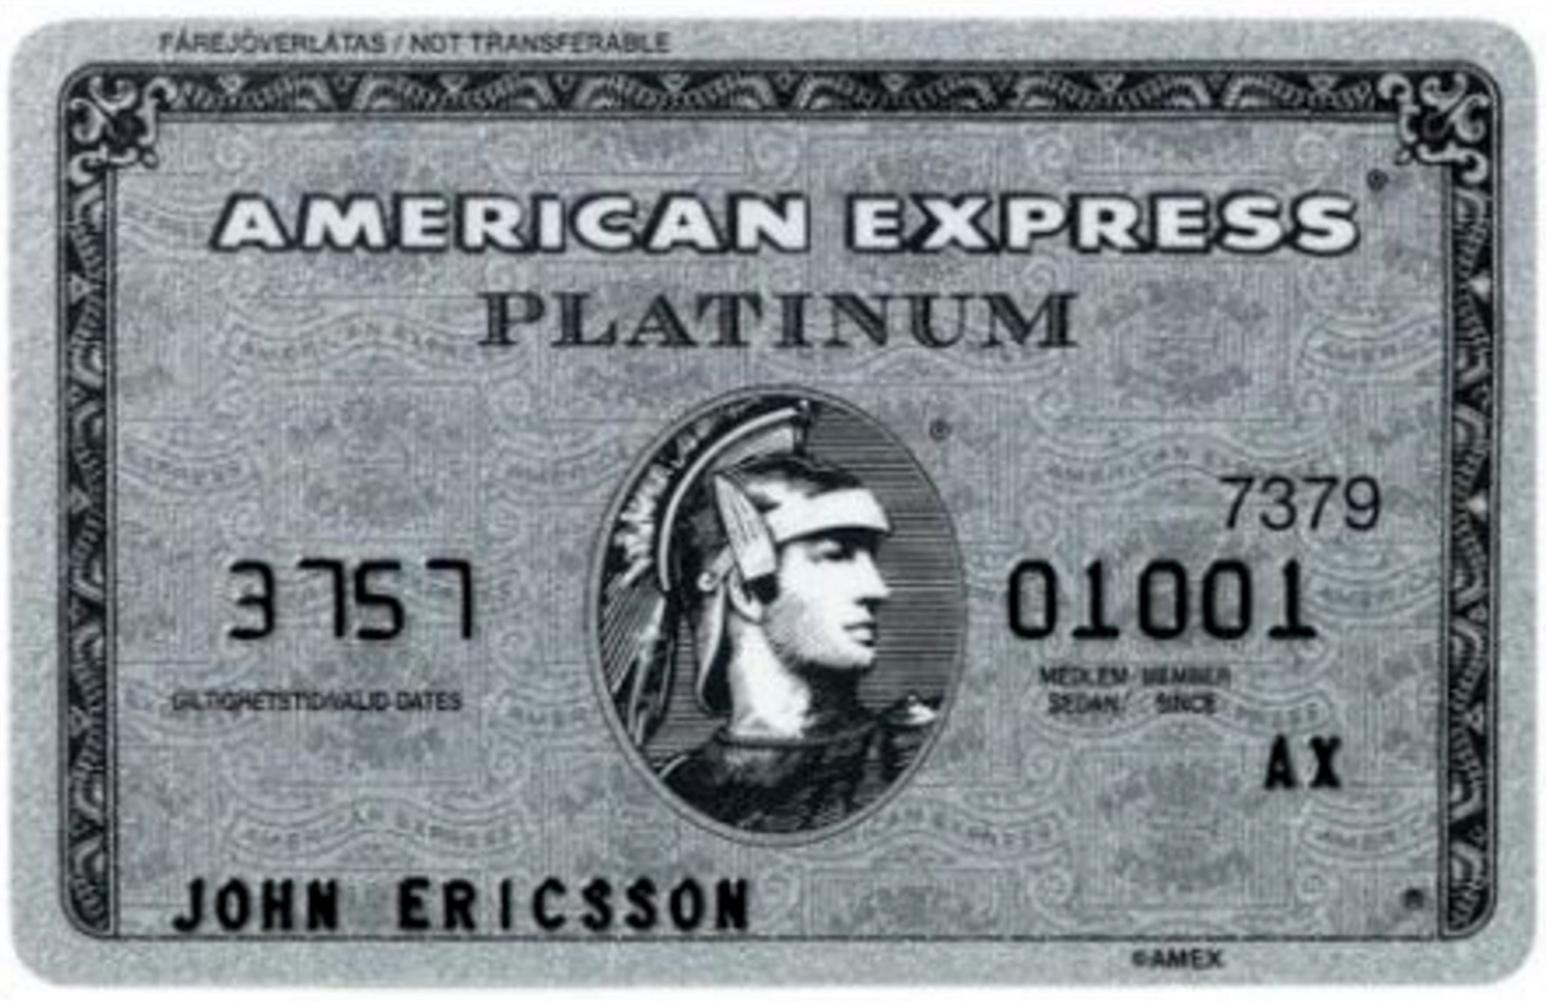 американ экспресс.png